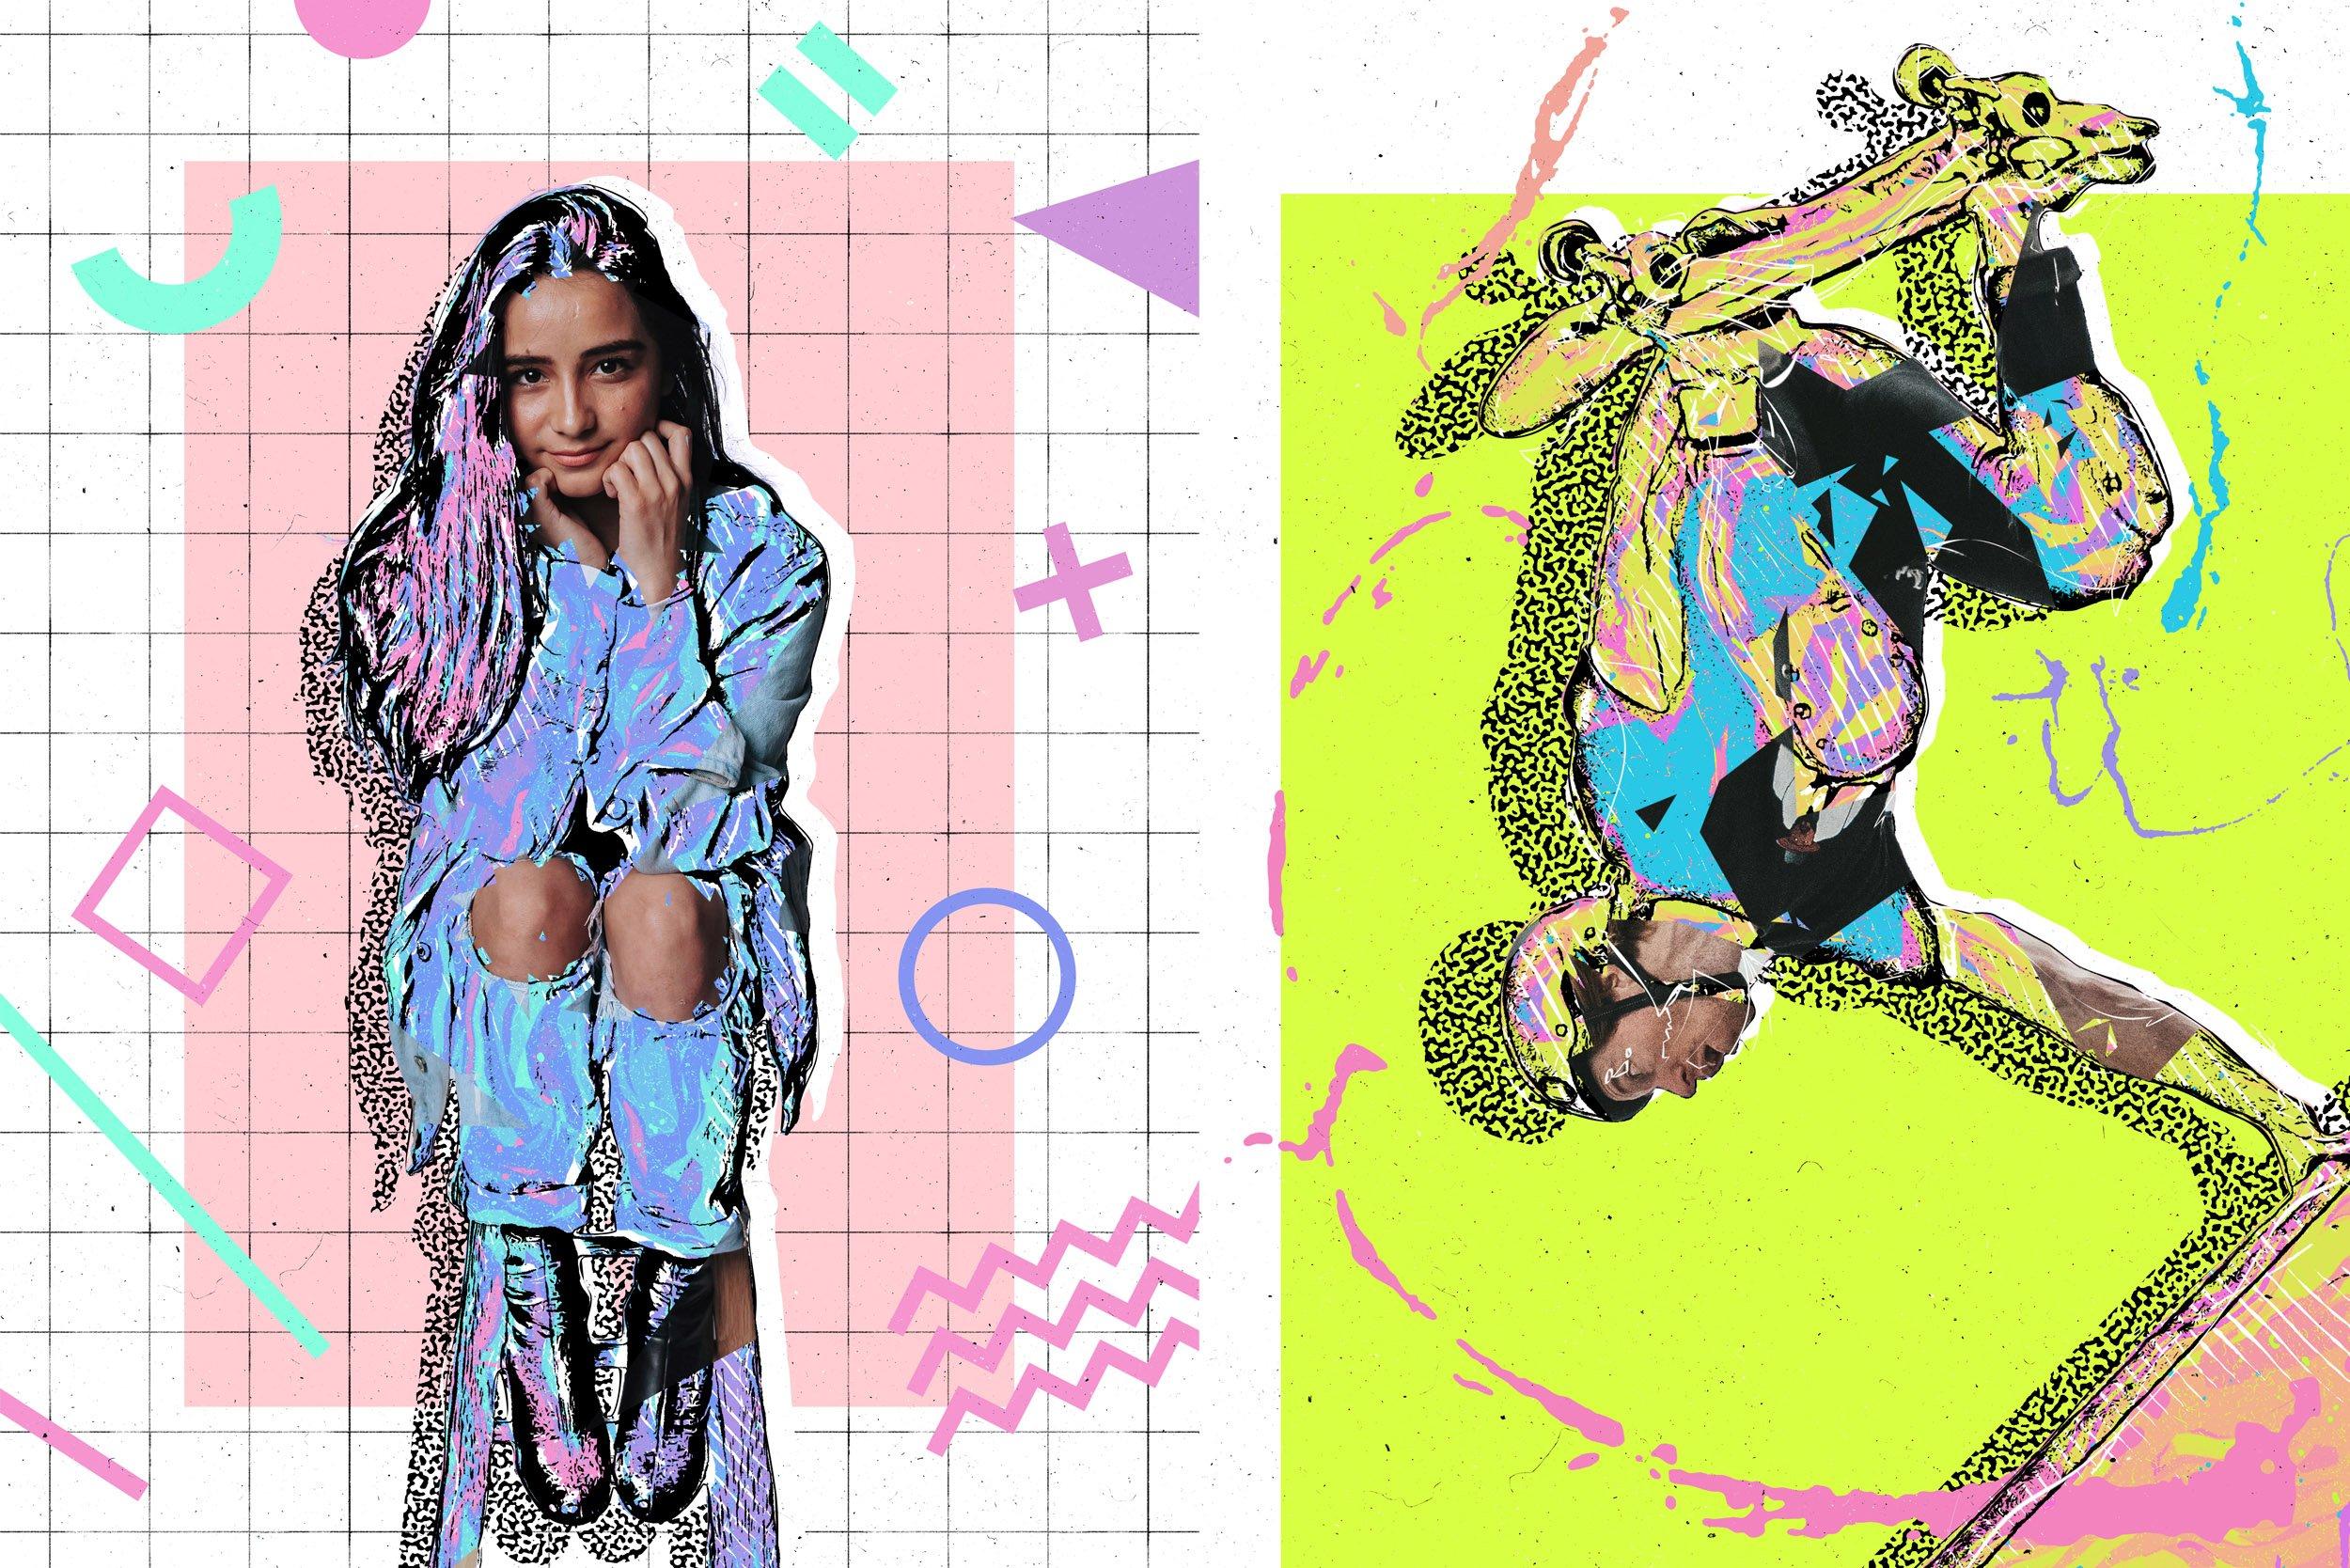 炫酷90年代多彩平面构图海报设计PS动作模板 Back To The 90s Photoshop Action插图2